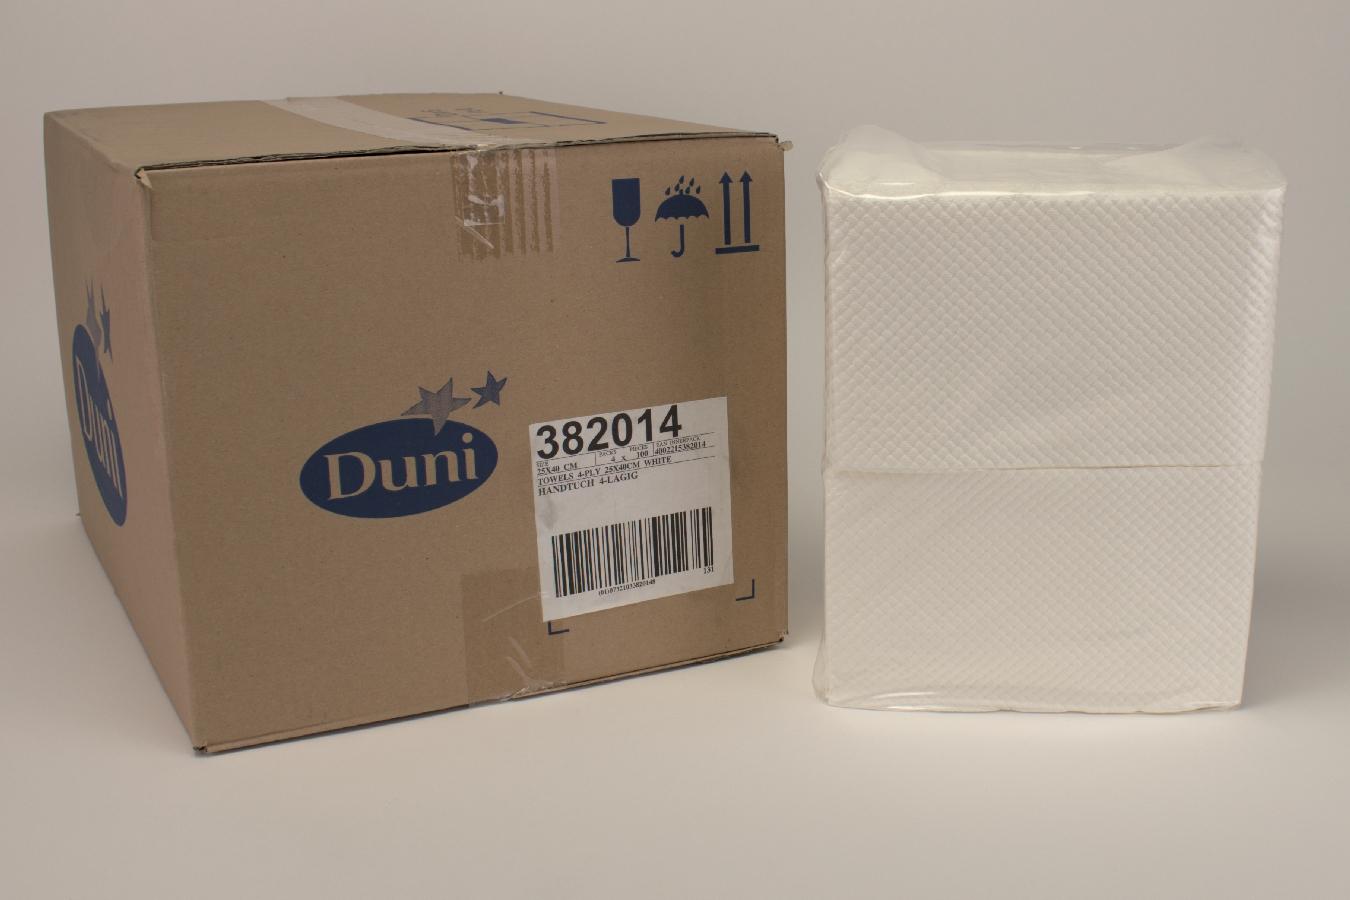 Duni Handtuch weiß 25x40 4lg 4x100 Stück